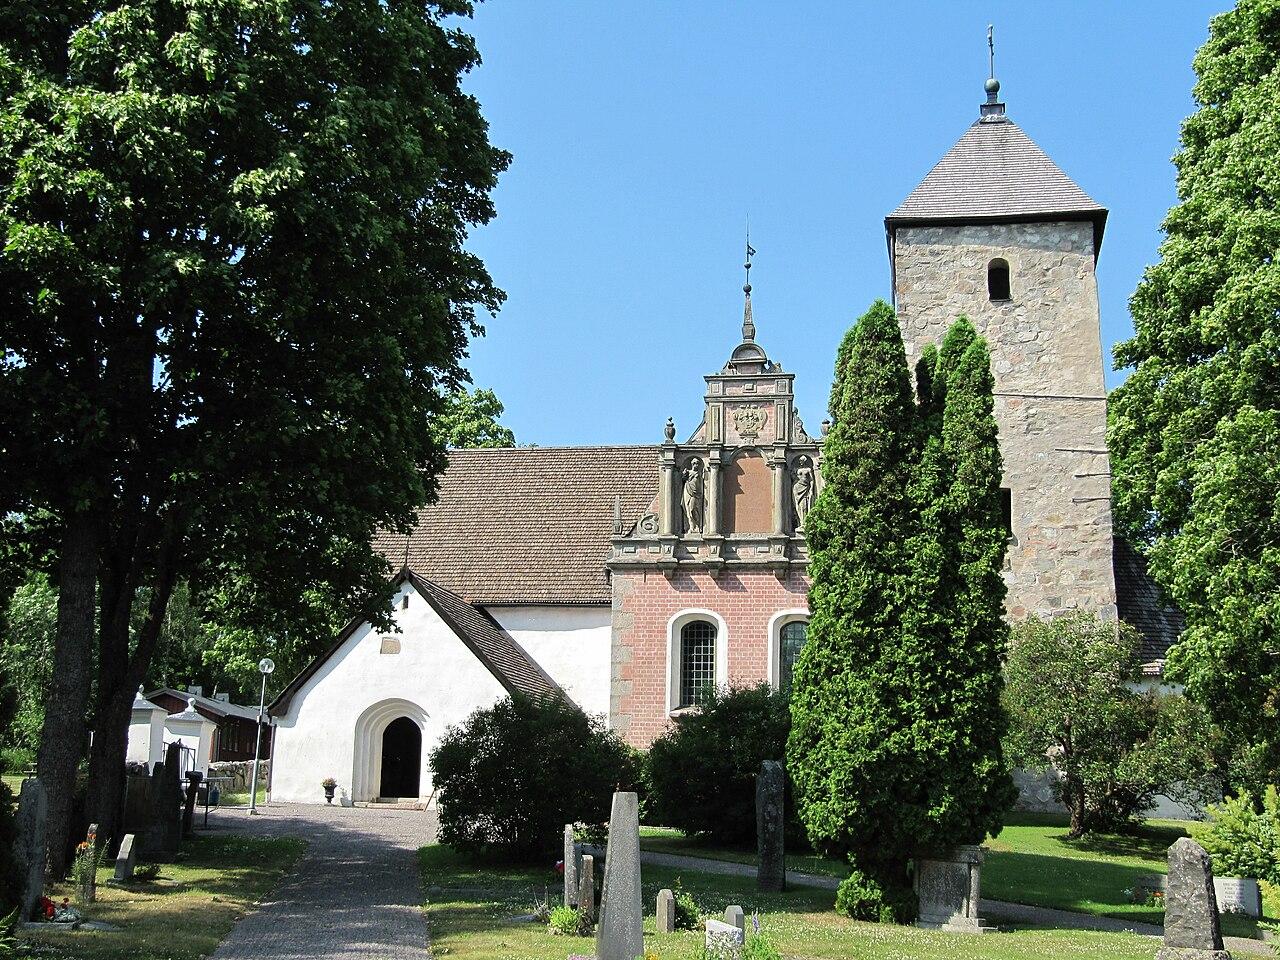 Norrsunda kyrka in Rosersberg, Stockholms ln - Find A